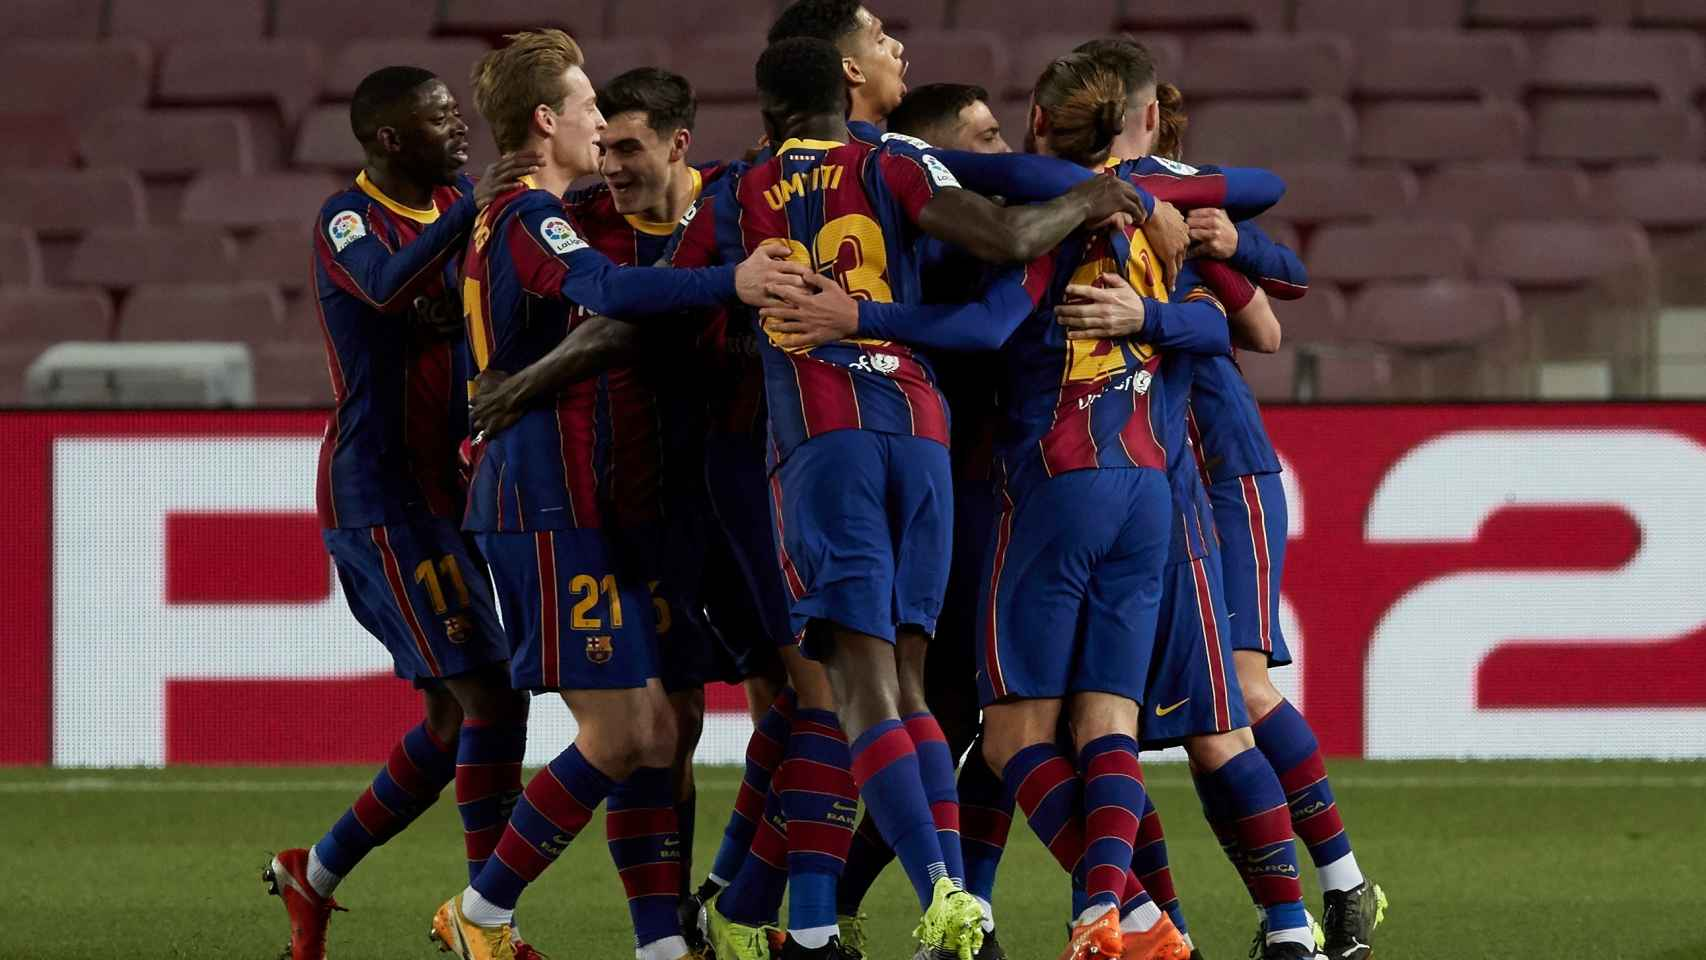 Los jugadores del FC Barcelona celebran el gol de Messi